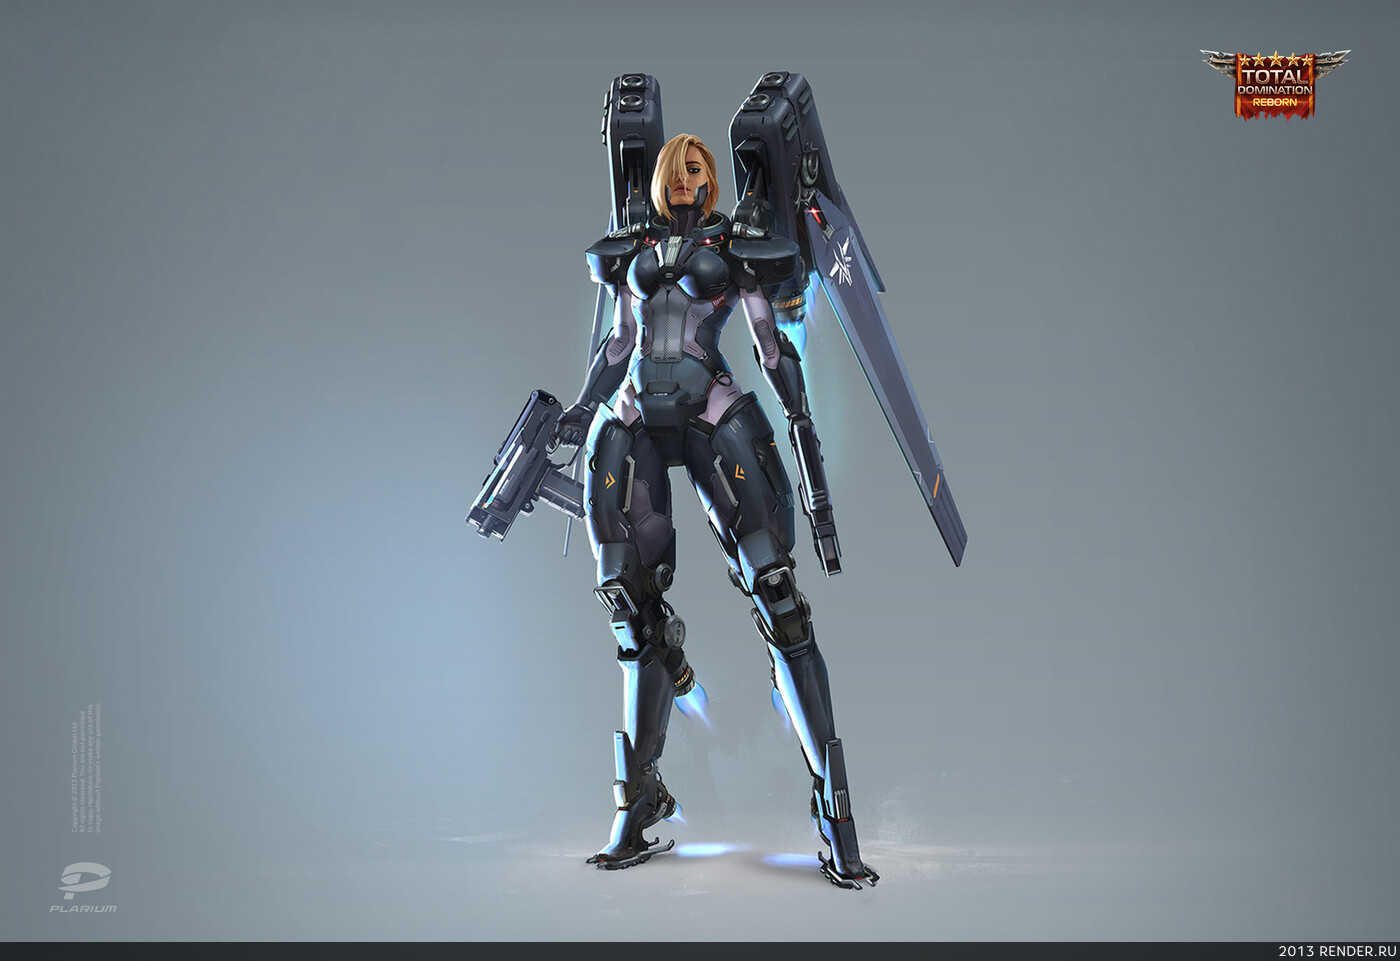 Digital 2D, game art, Concept Art, characterdesign, Plarium